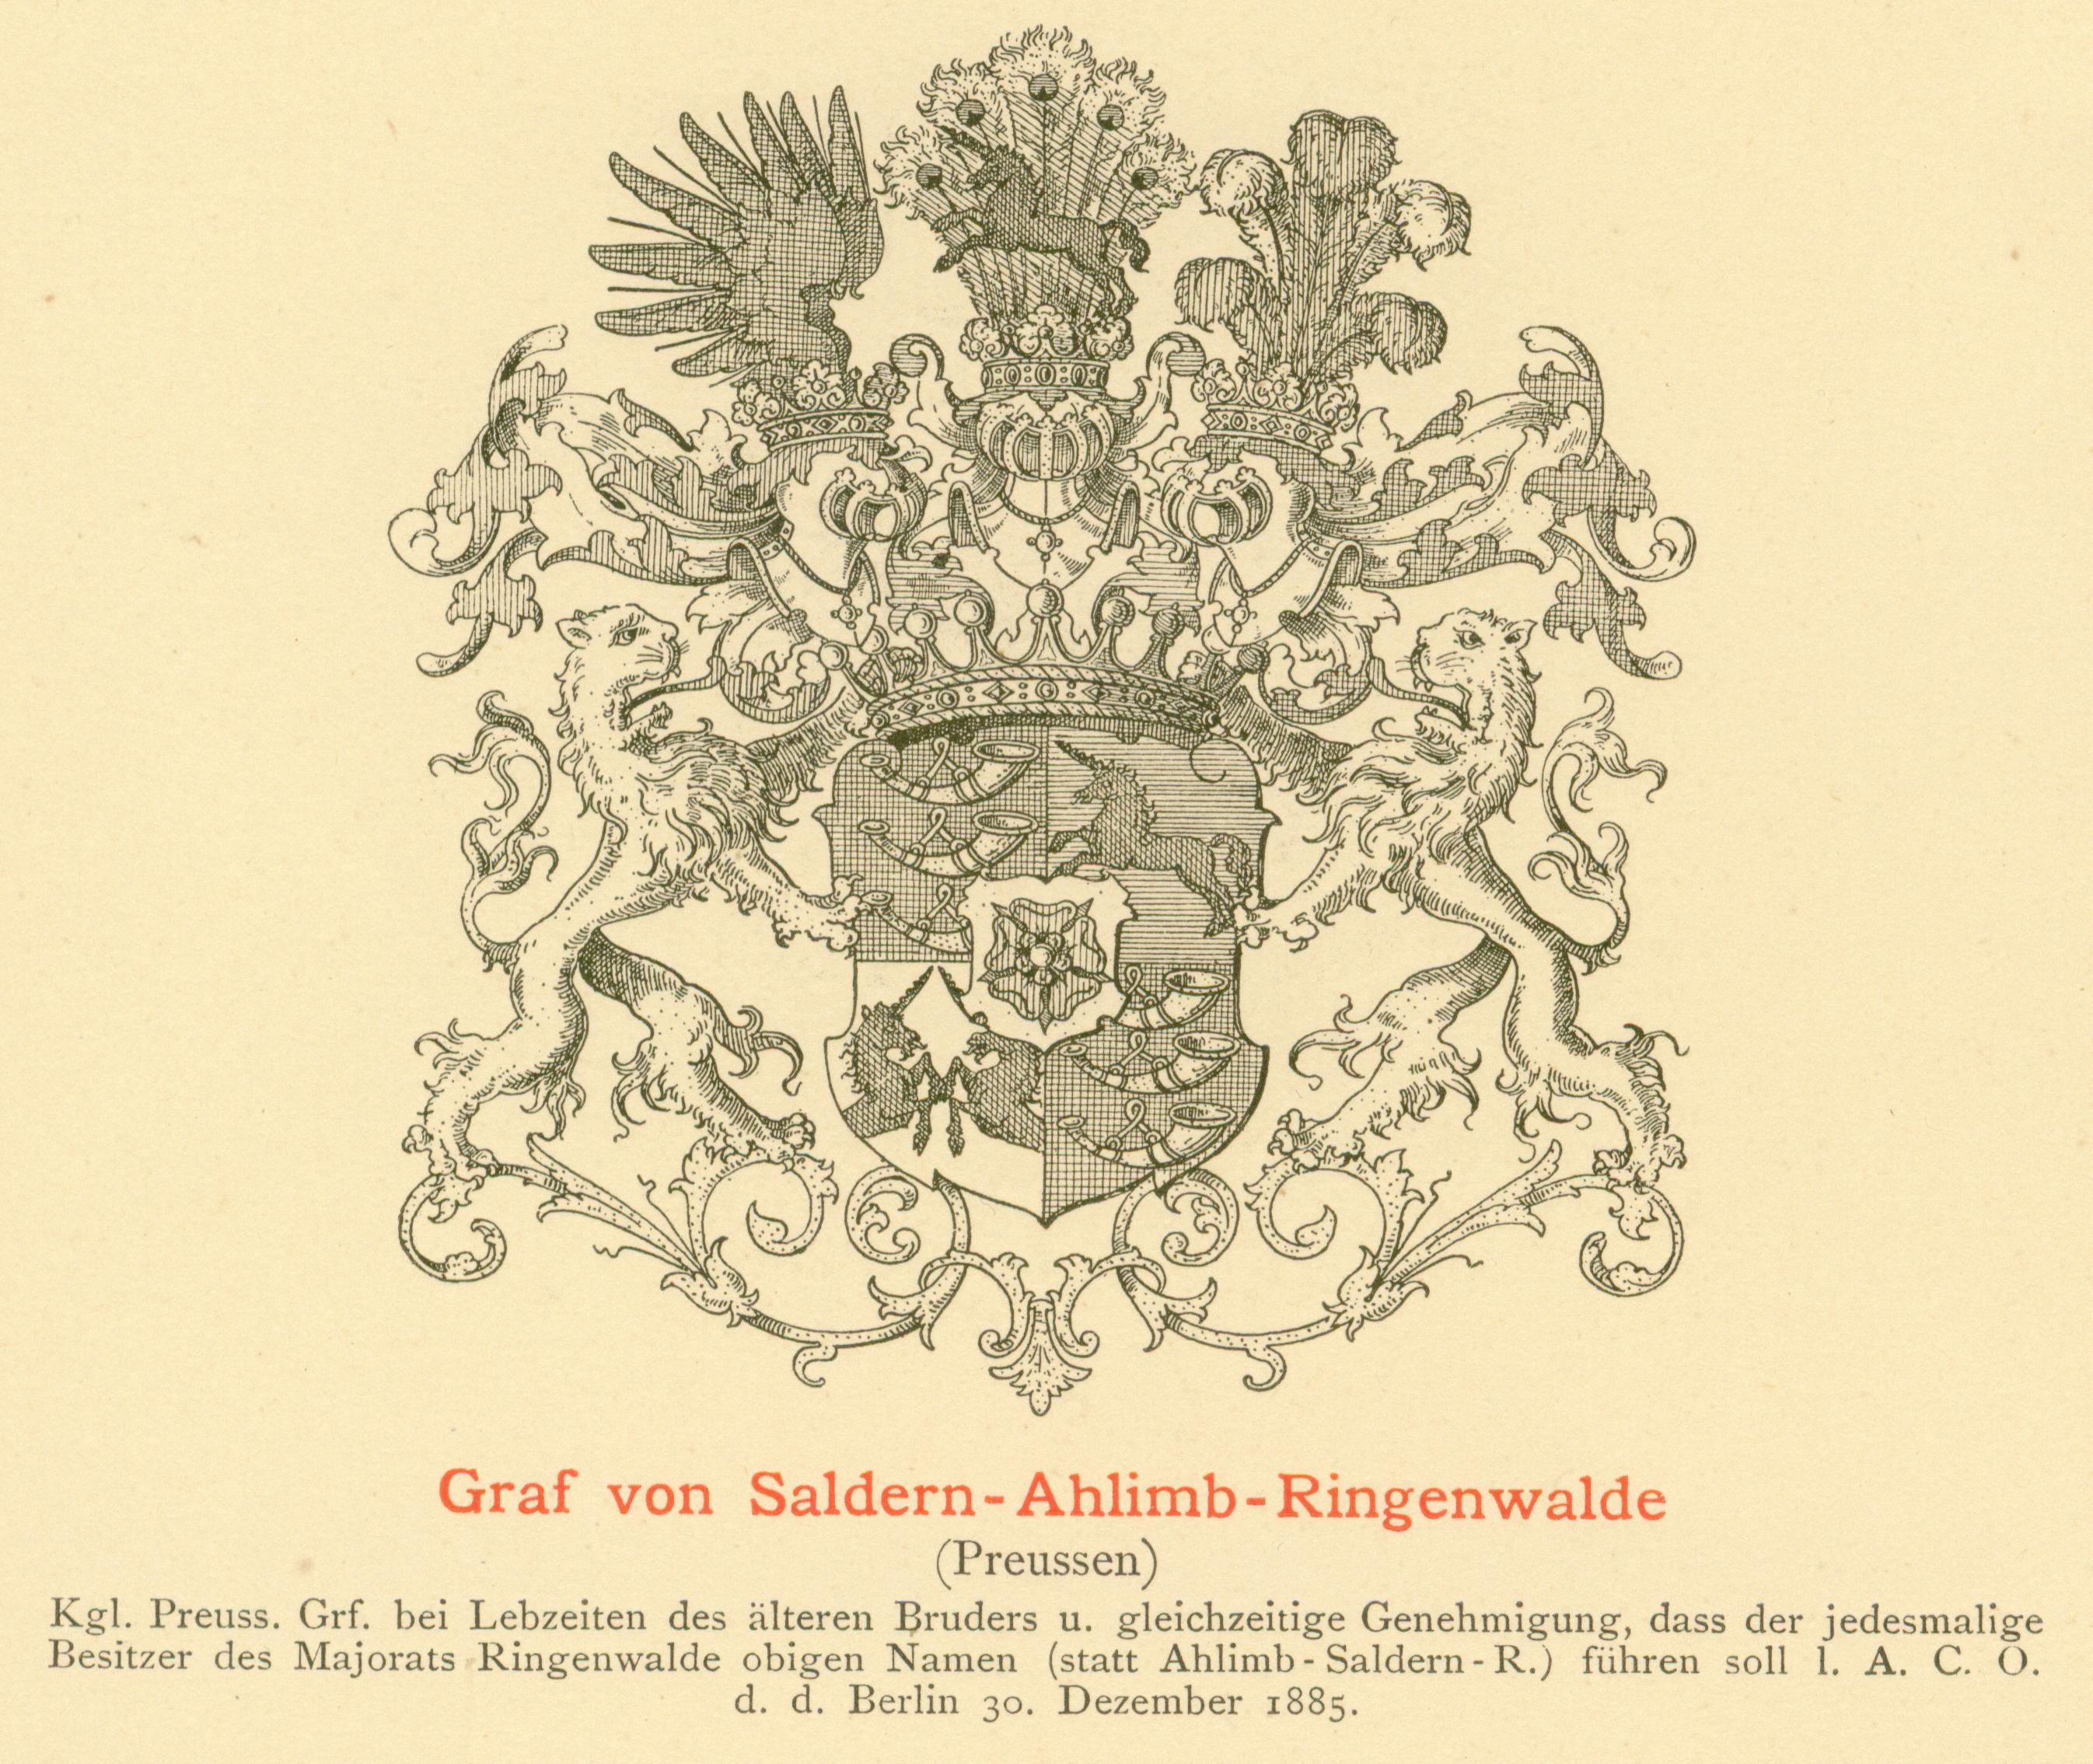 Saldern-Ahlimb-Ringenwalde